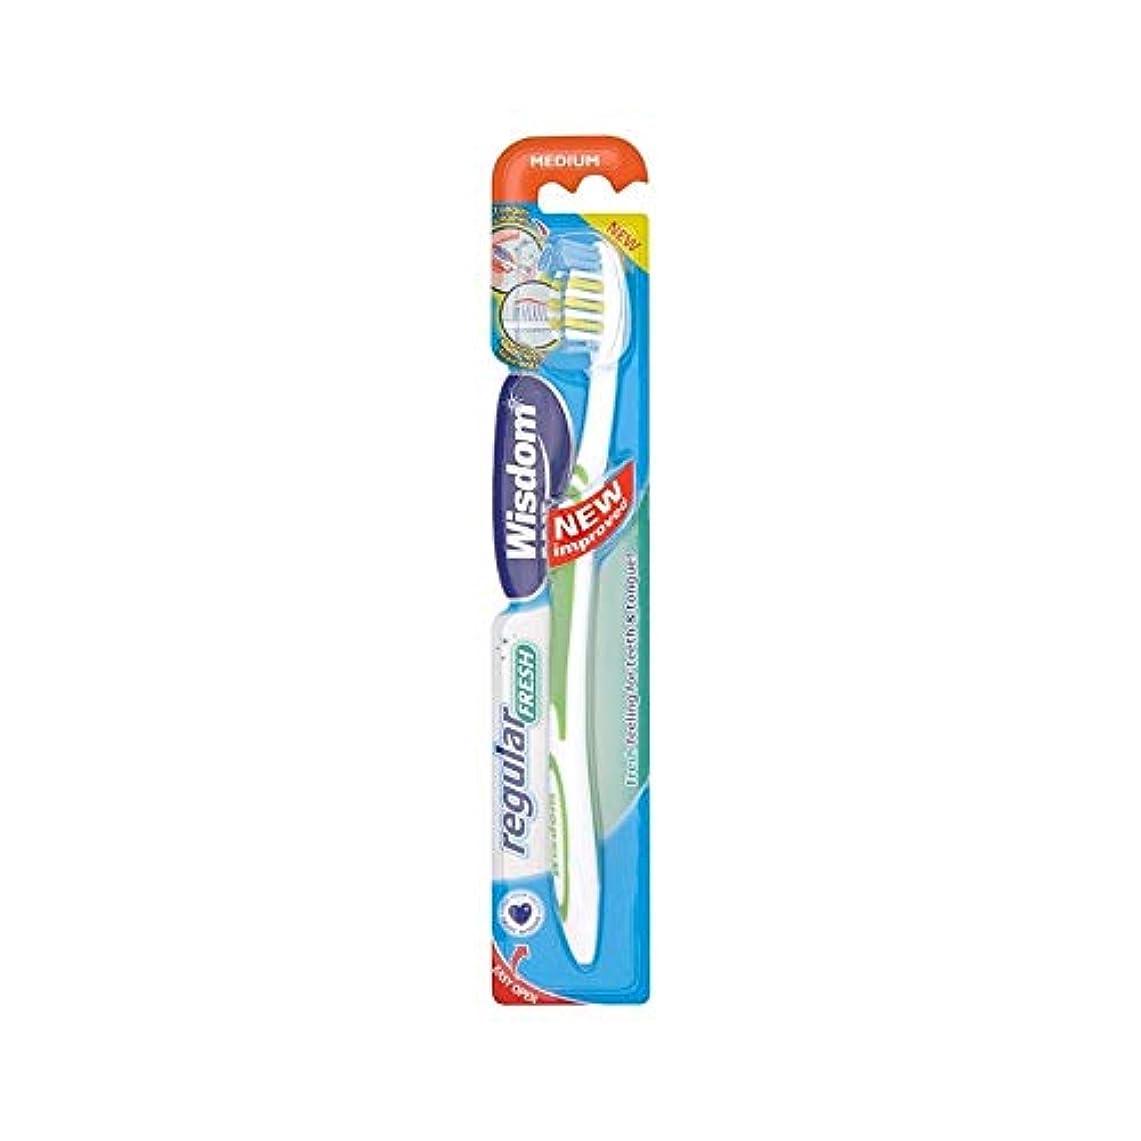 [Wisdom ] 12の知恵定期的に新鮮な培地歯ブラシパック - Wisdom Regular Fresh Medium Toothbrush Pack of 12 [並行輸入品]